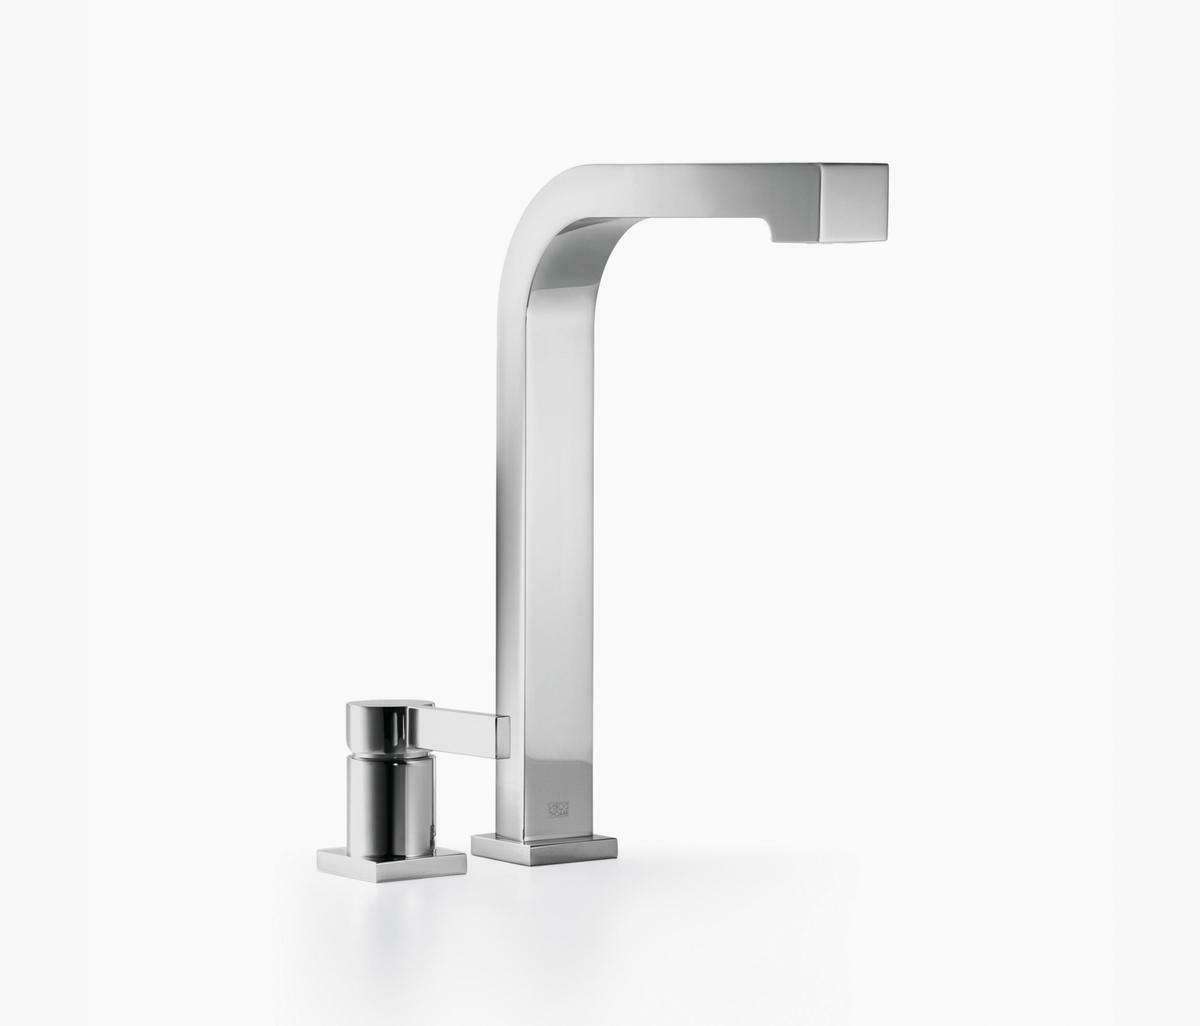 maro kitchen faucet with hand sprayer